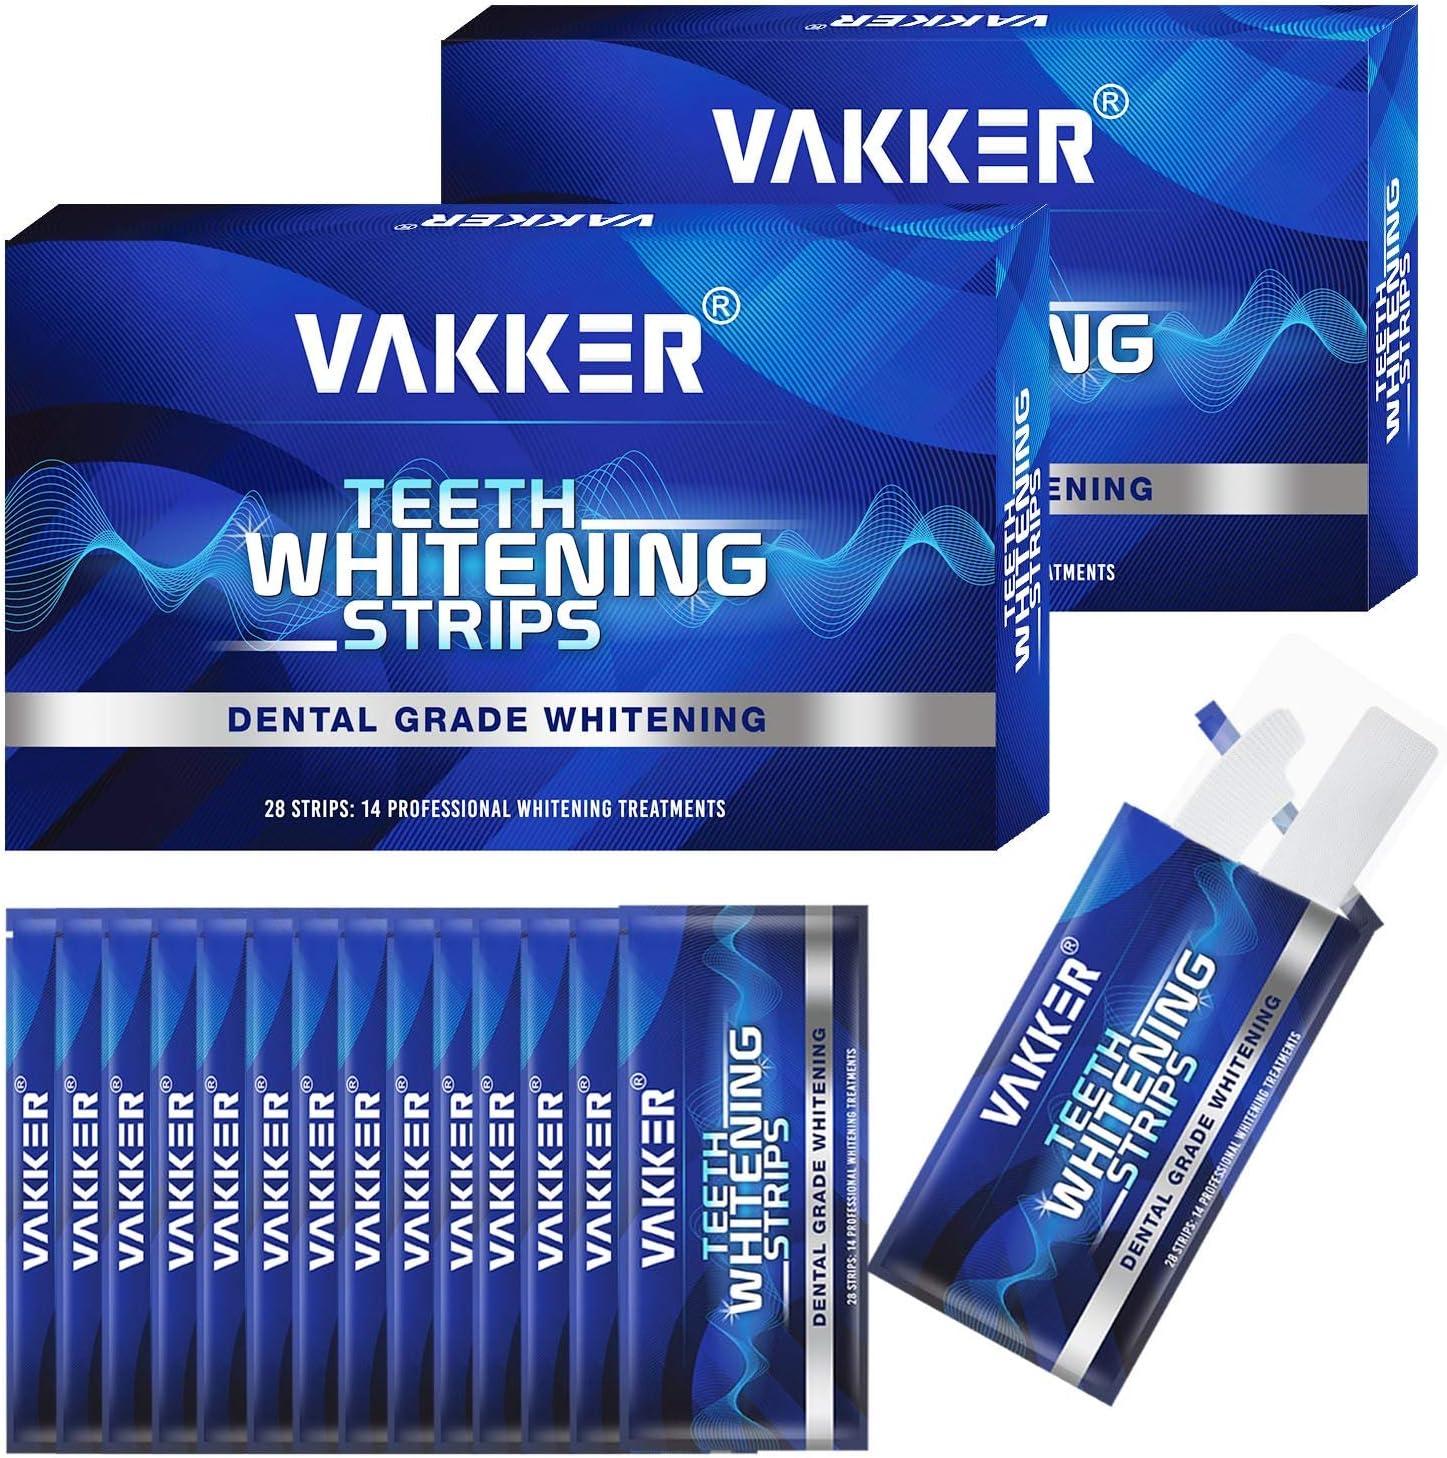 San Antonio Mall Teeth Whitening Strip VAKKER 28 Very popular Teet Non-Sensitive White Strips